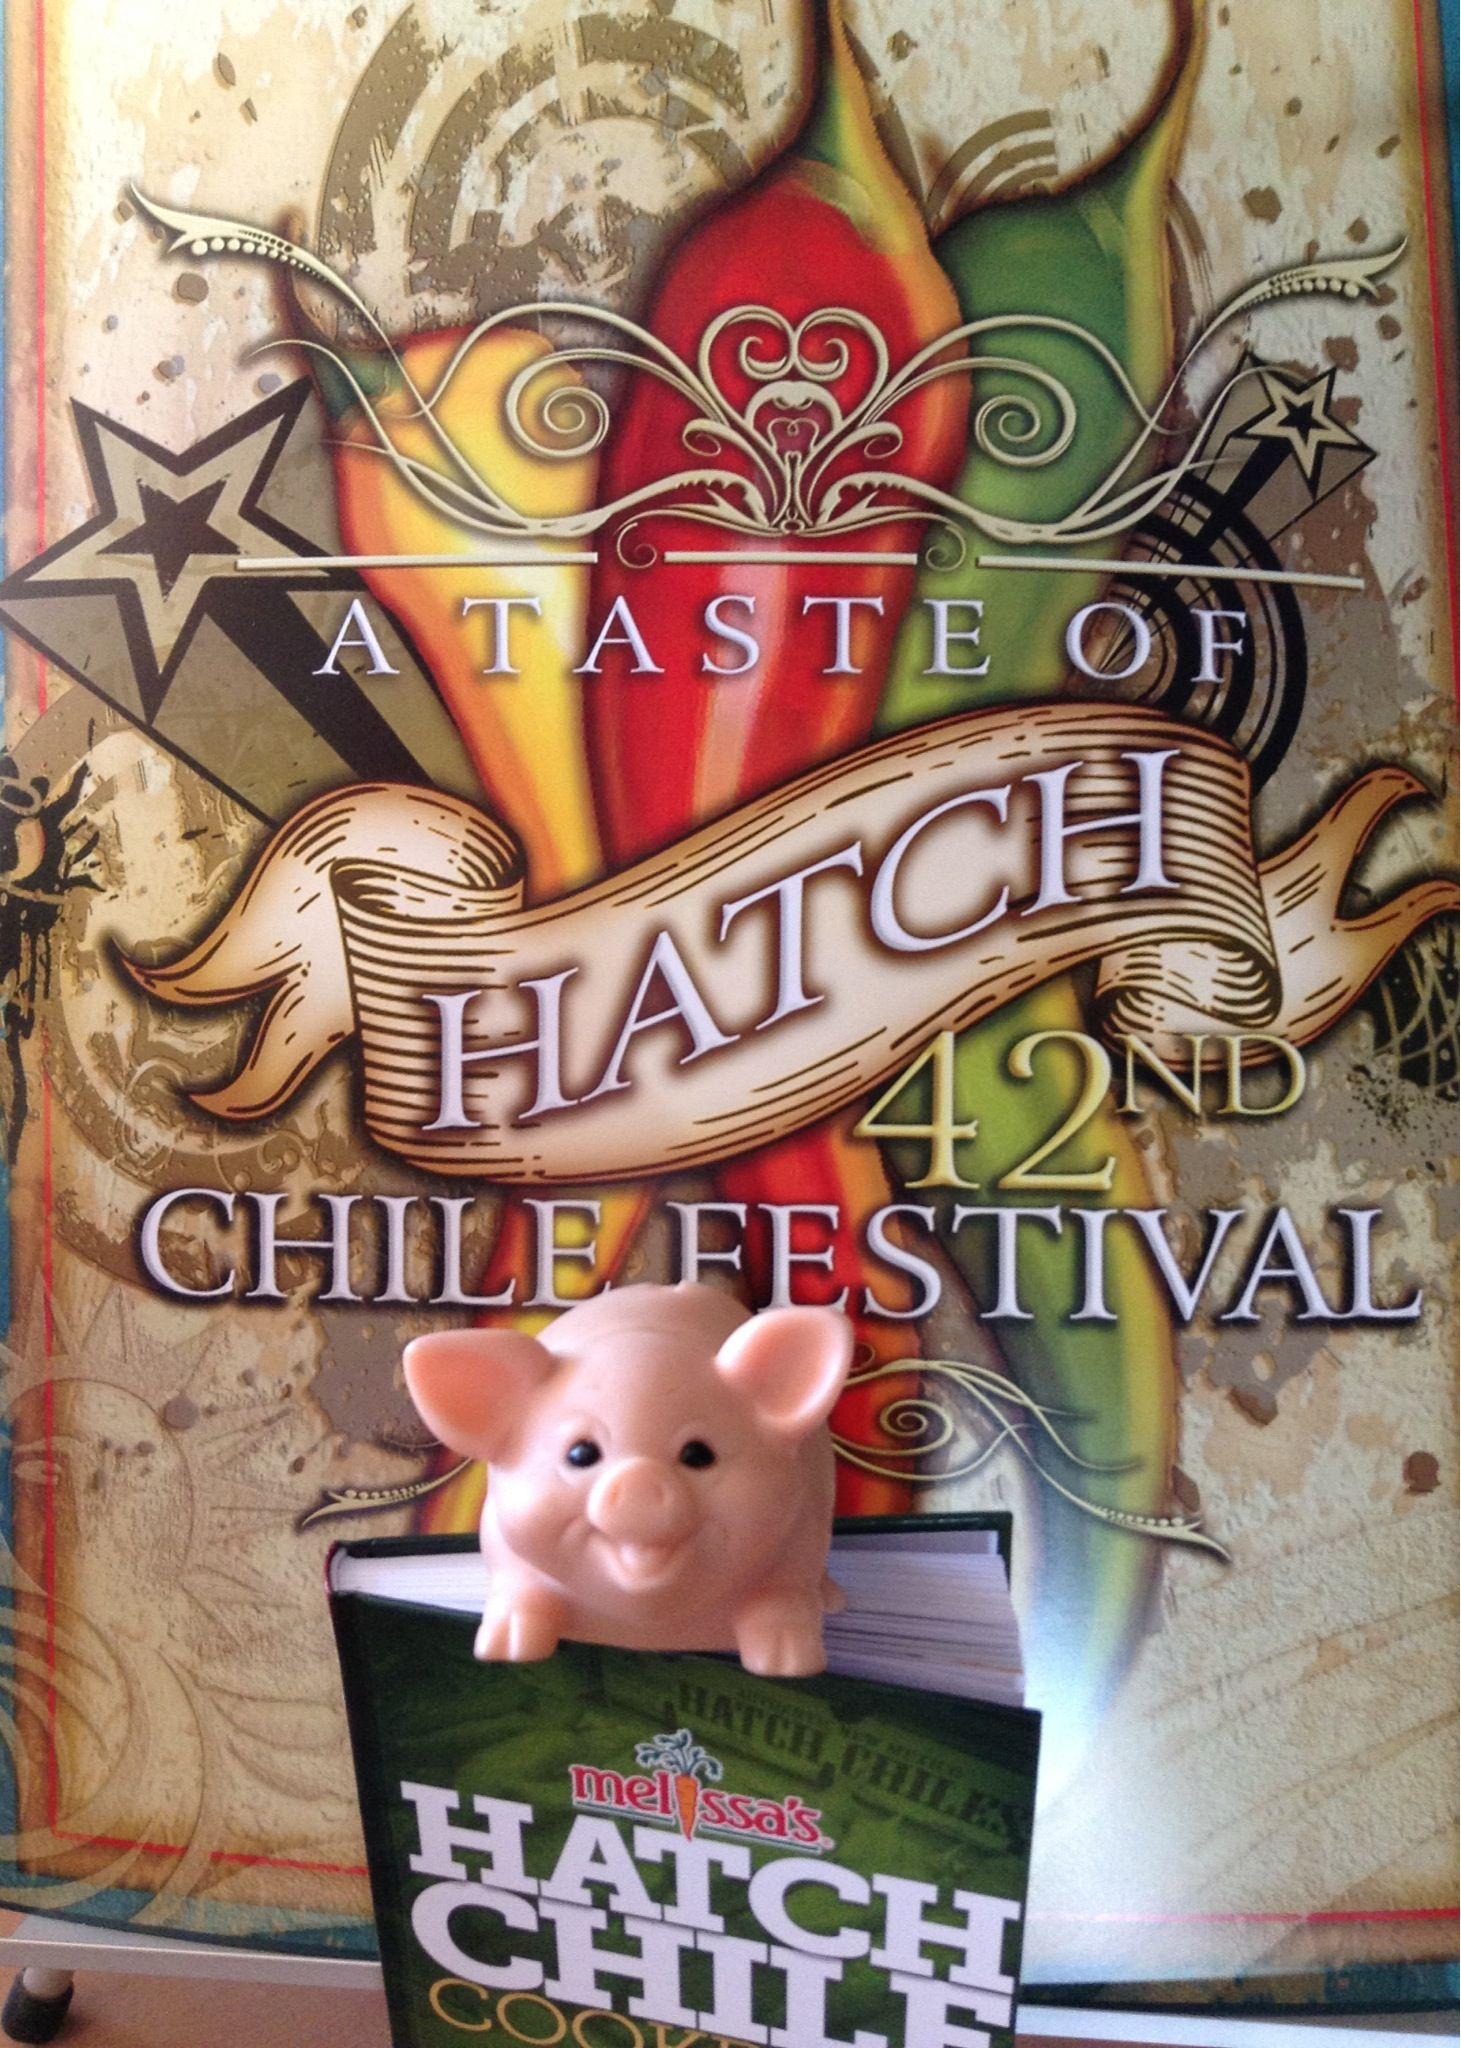 Hatch Chile Festival Nm Hatch Chile Festival New Mexico Chile Festivals Around The World